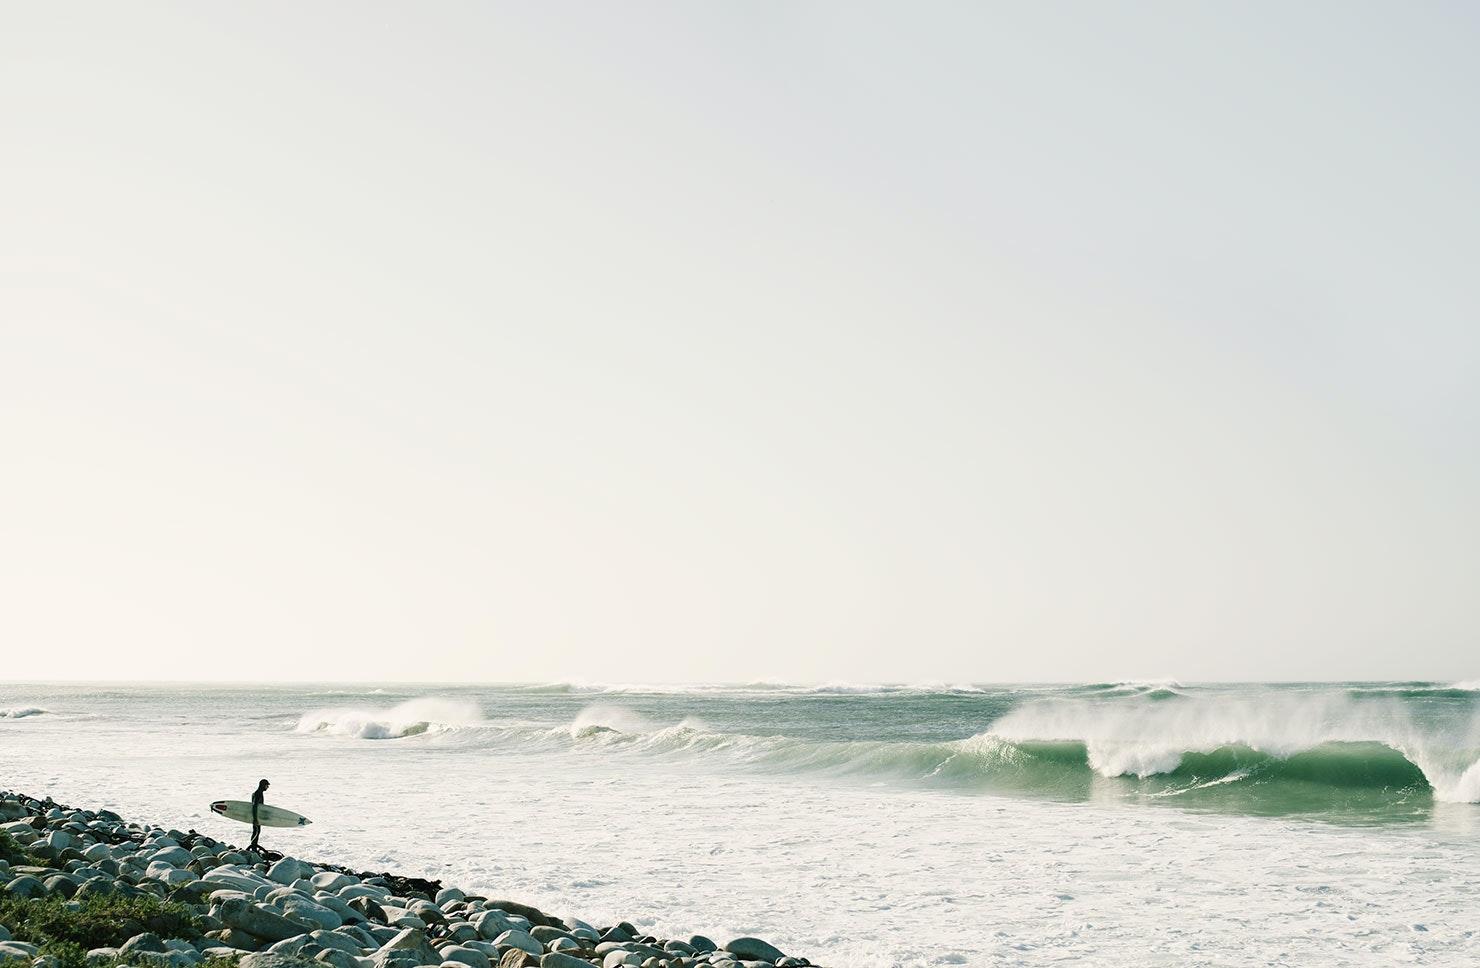 CHRISTINE FLYNN - SOUTHAFRICA_SURFER